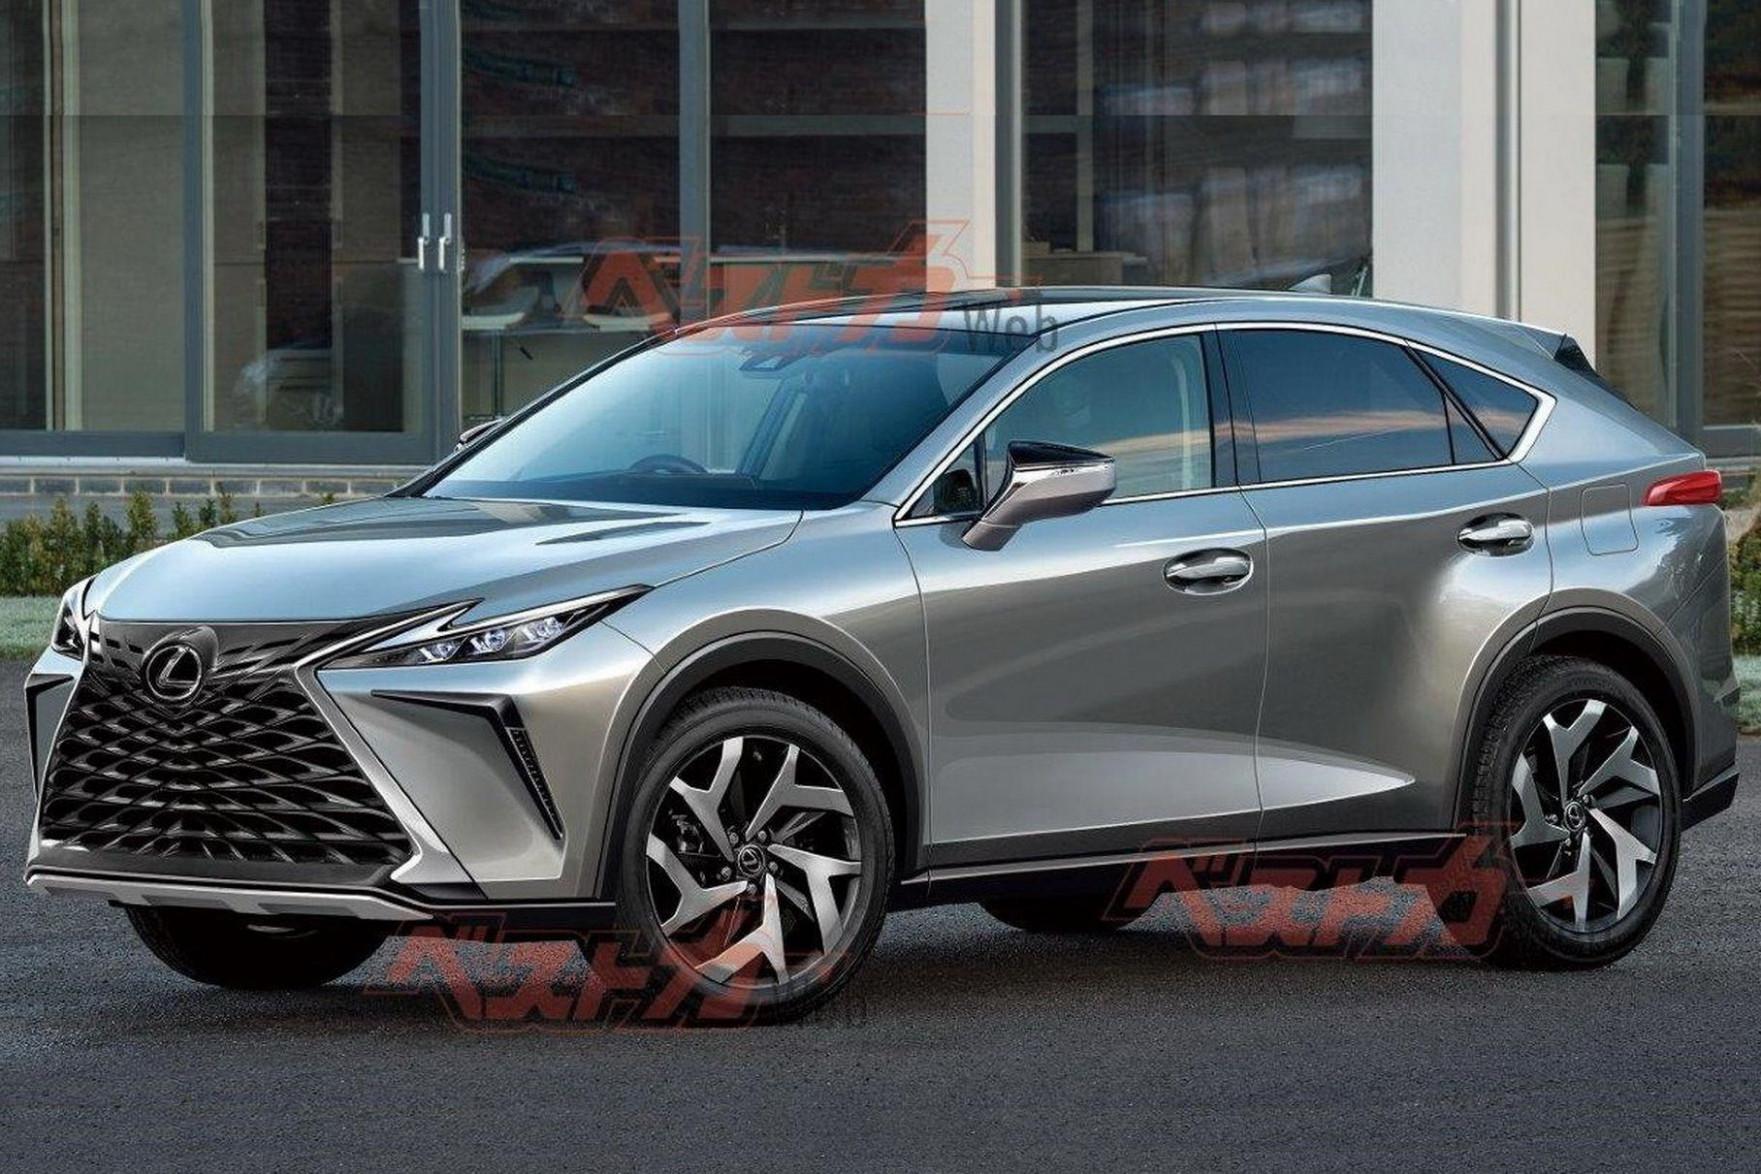 New Model and Performance 2022 Toyota RAV4